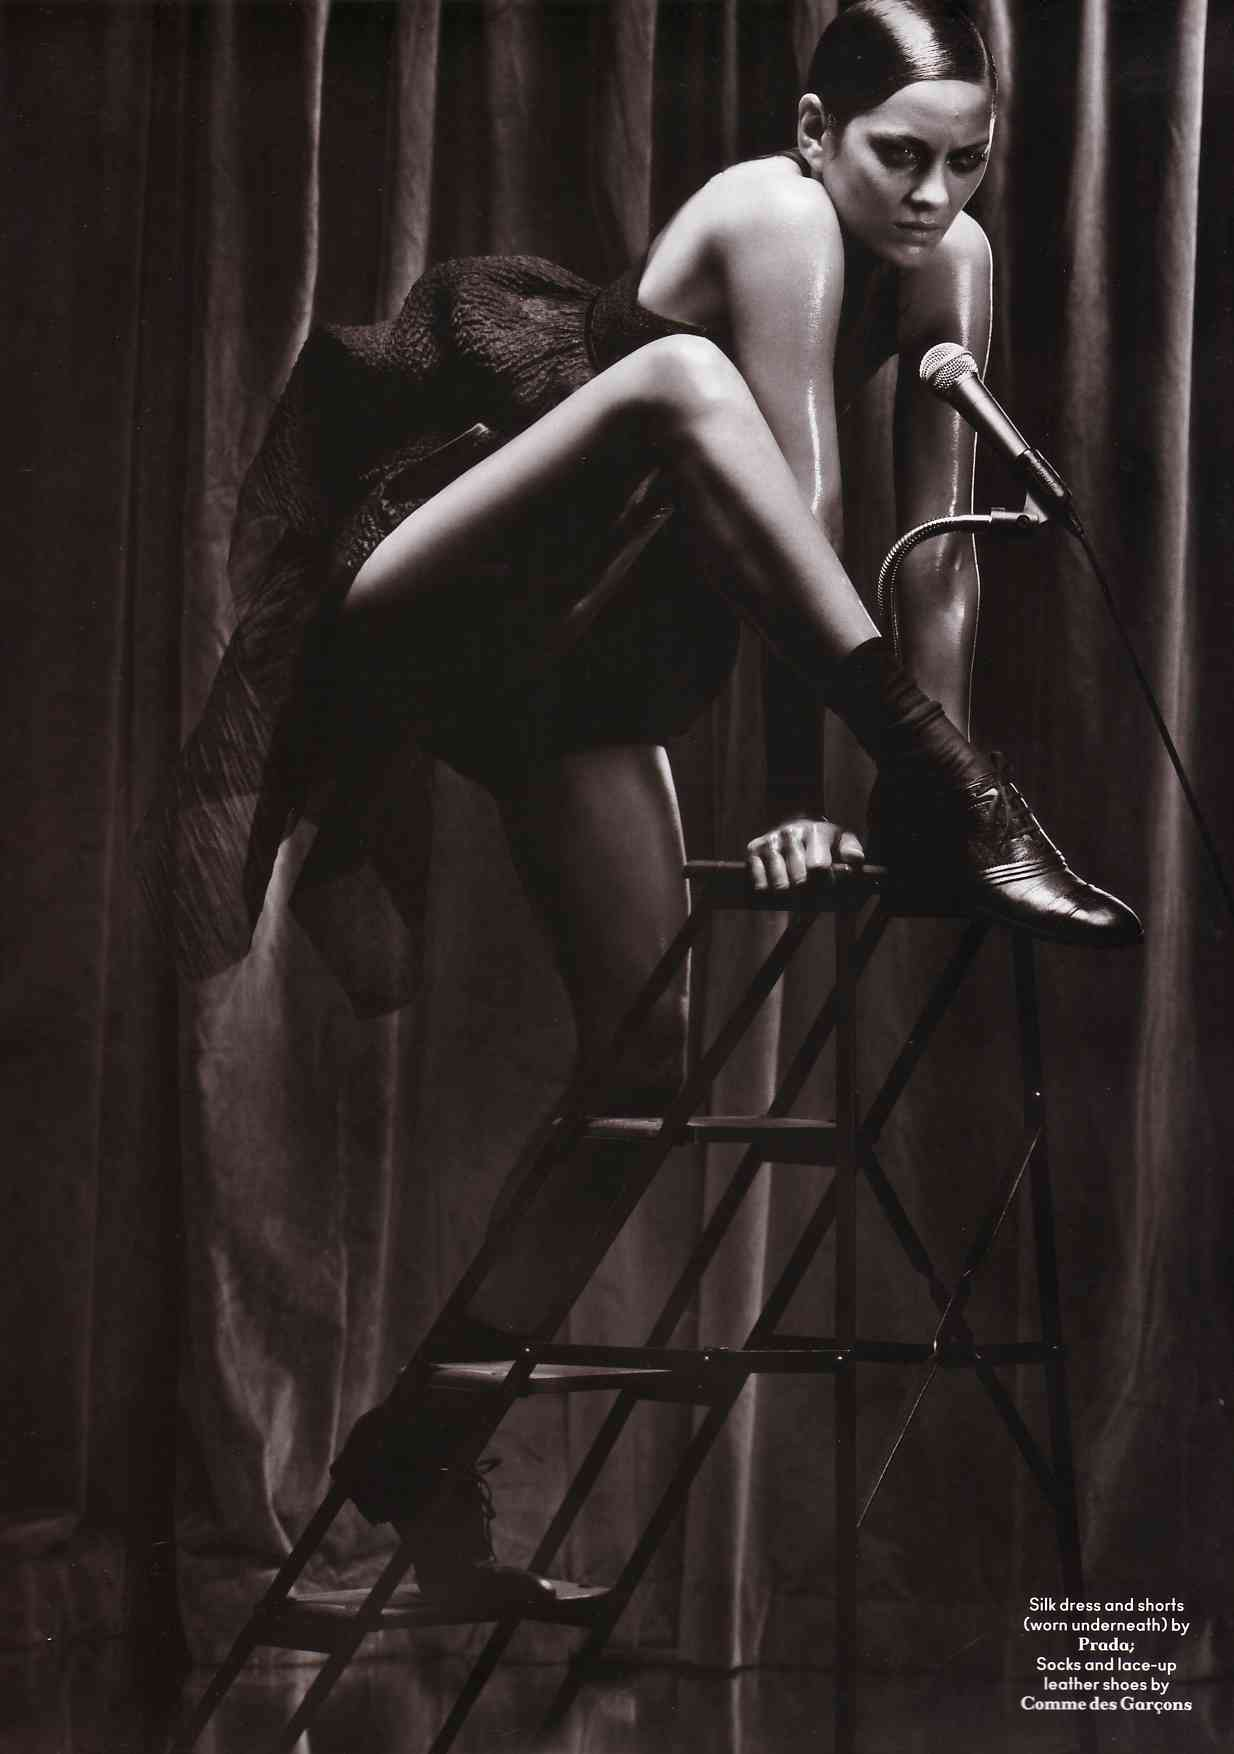 Erotica Marion Cotillard nude (44 photos), Ass, Cleavage, Selfie, butt 2015